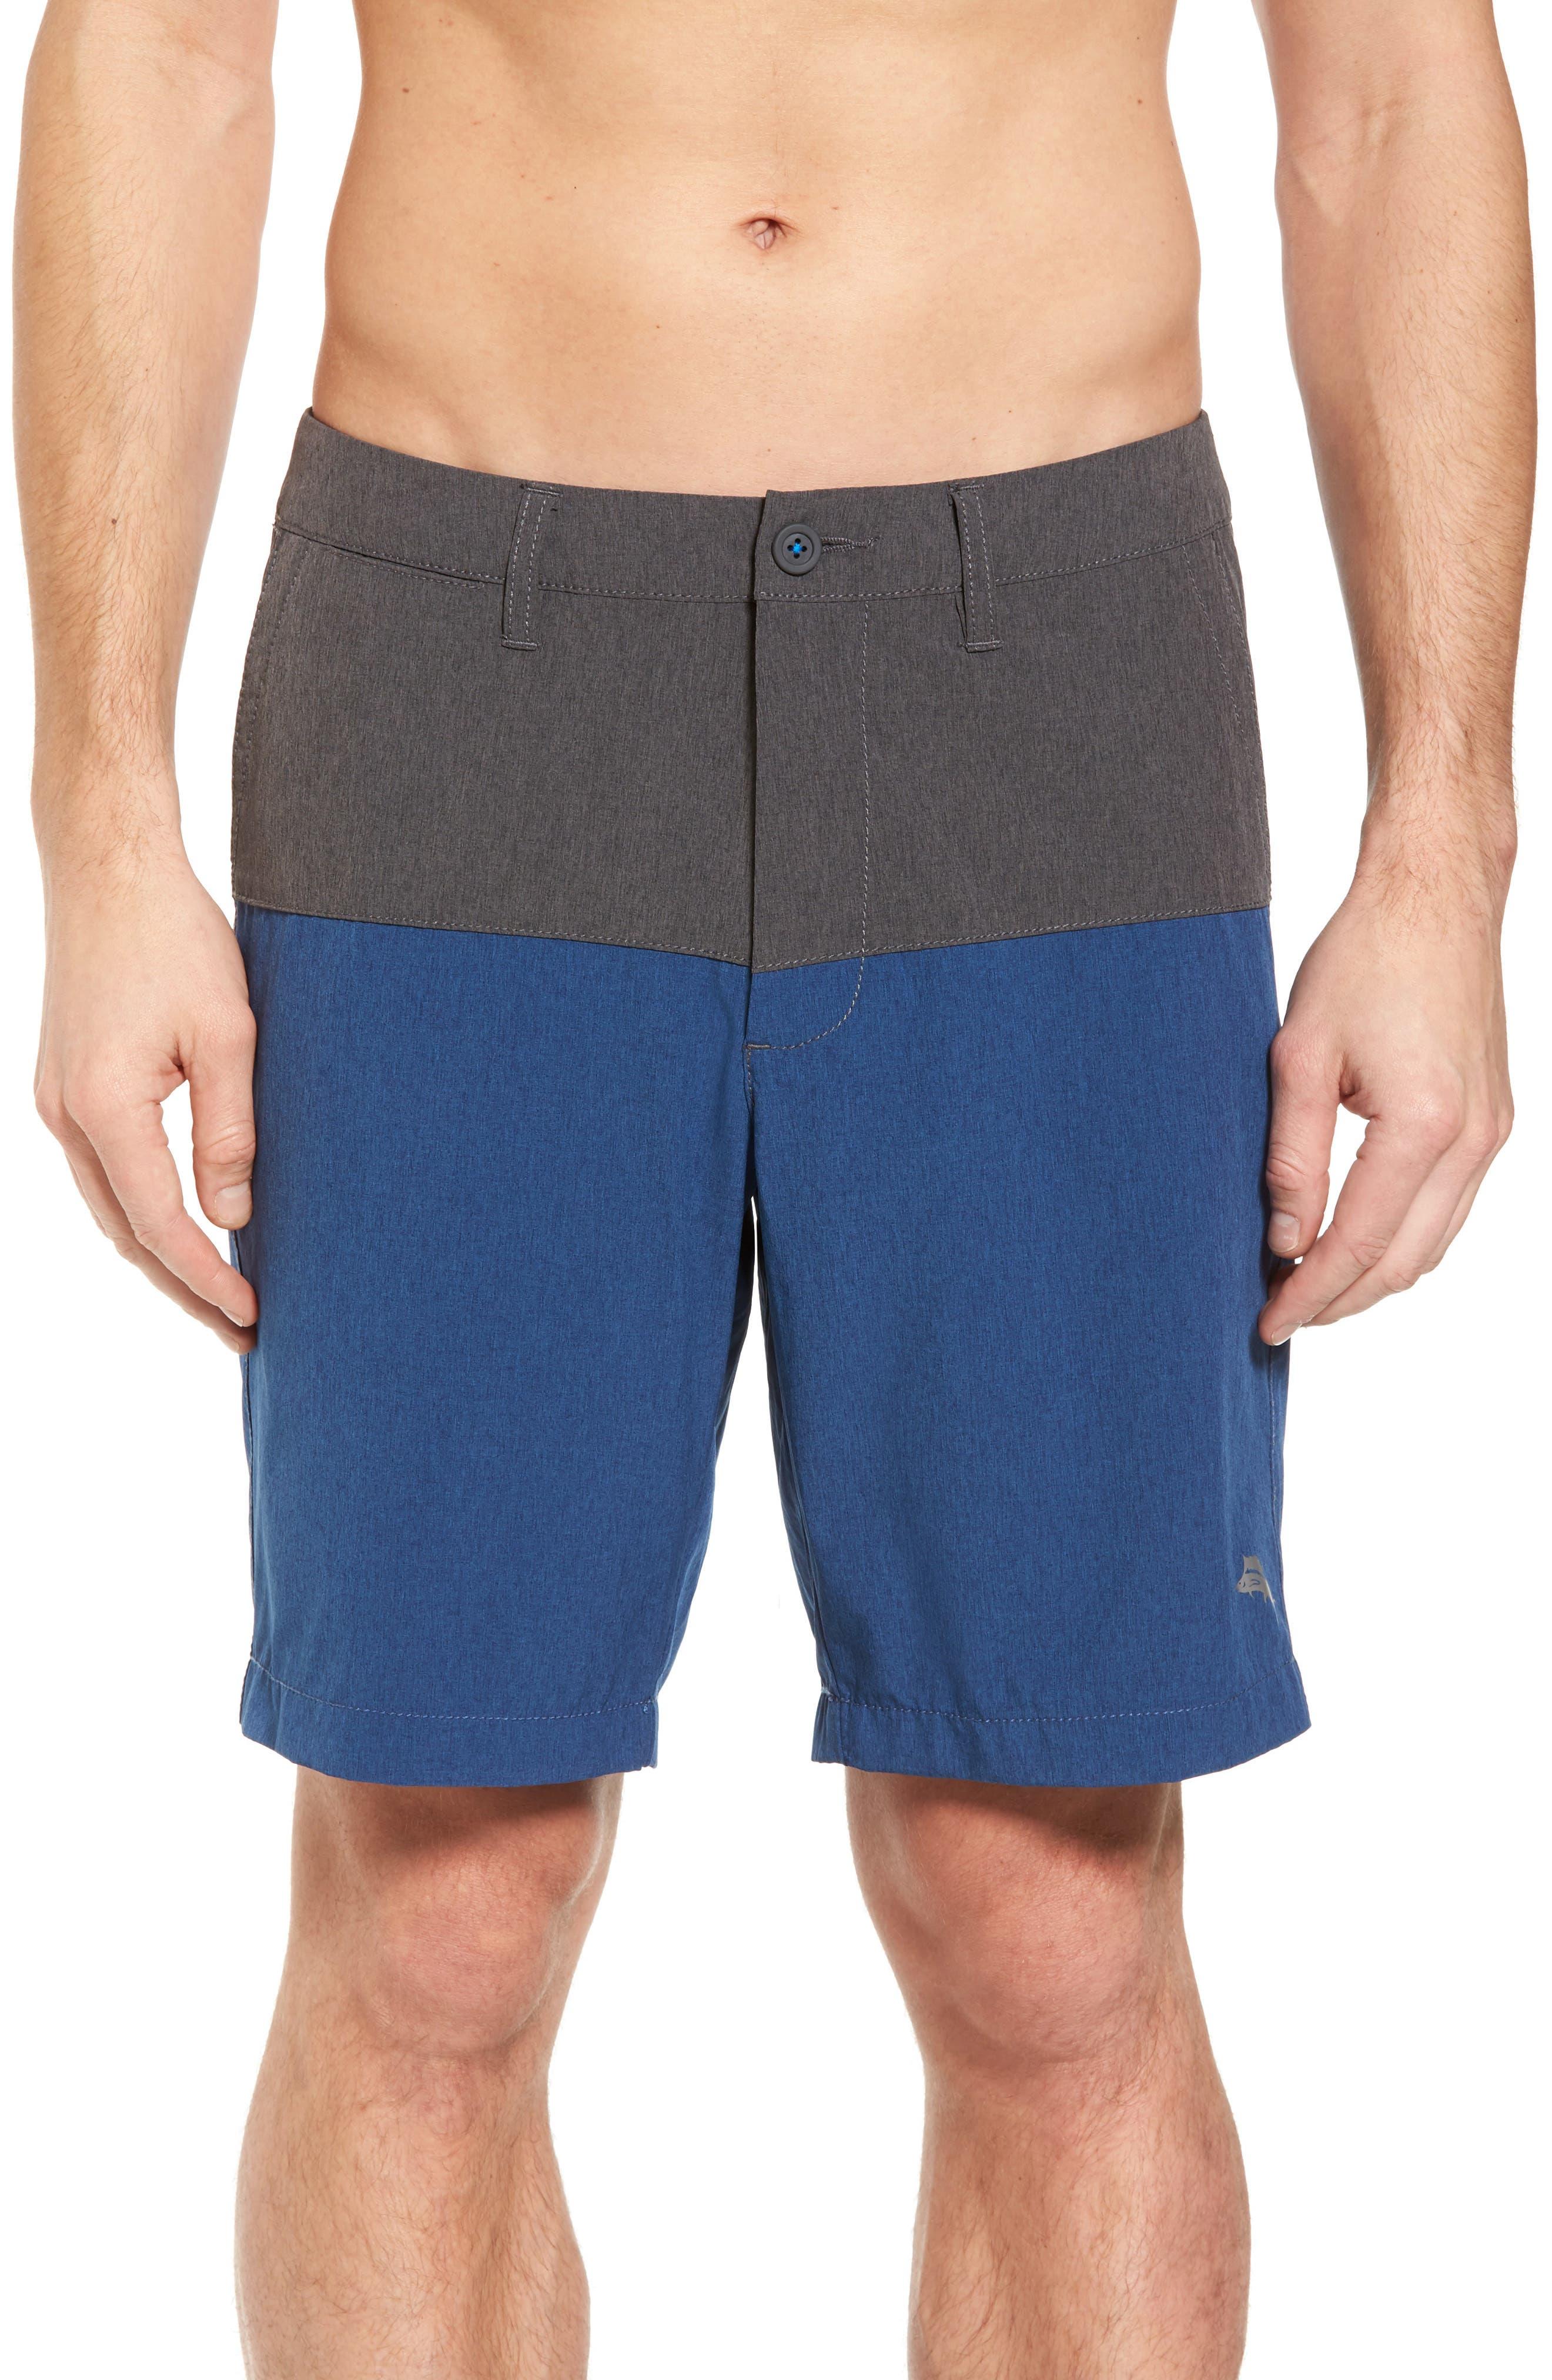 Cayman Block & Roll Hybrid Swim Shorts,                             Main thumbnail 1, color,                             Deep Marine